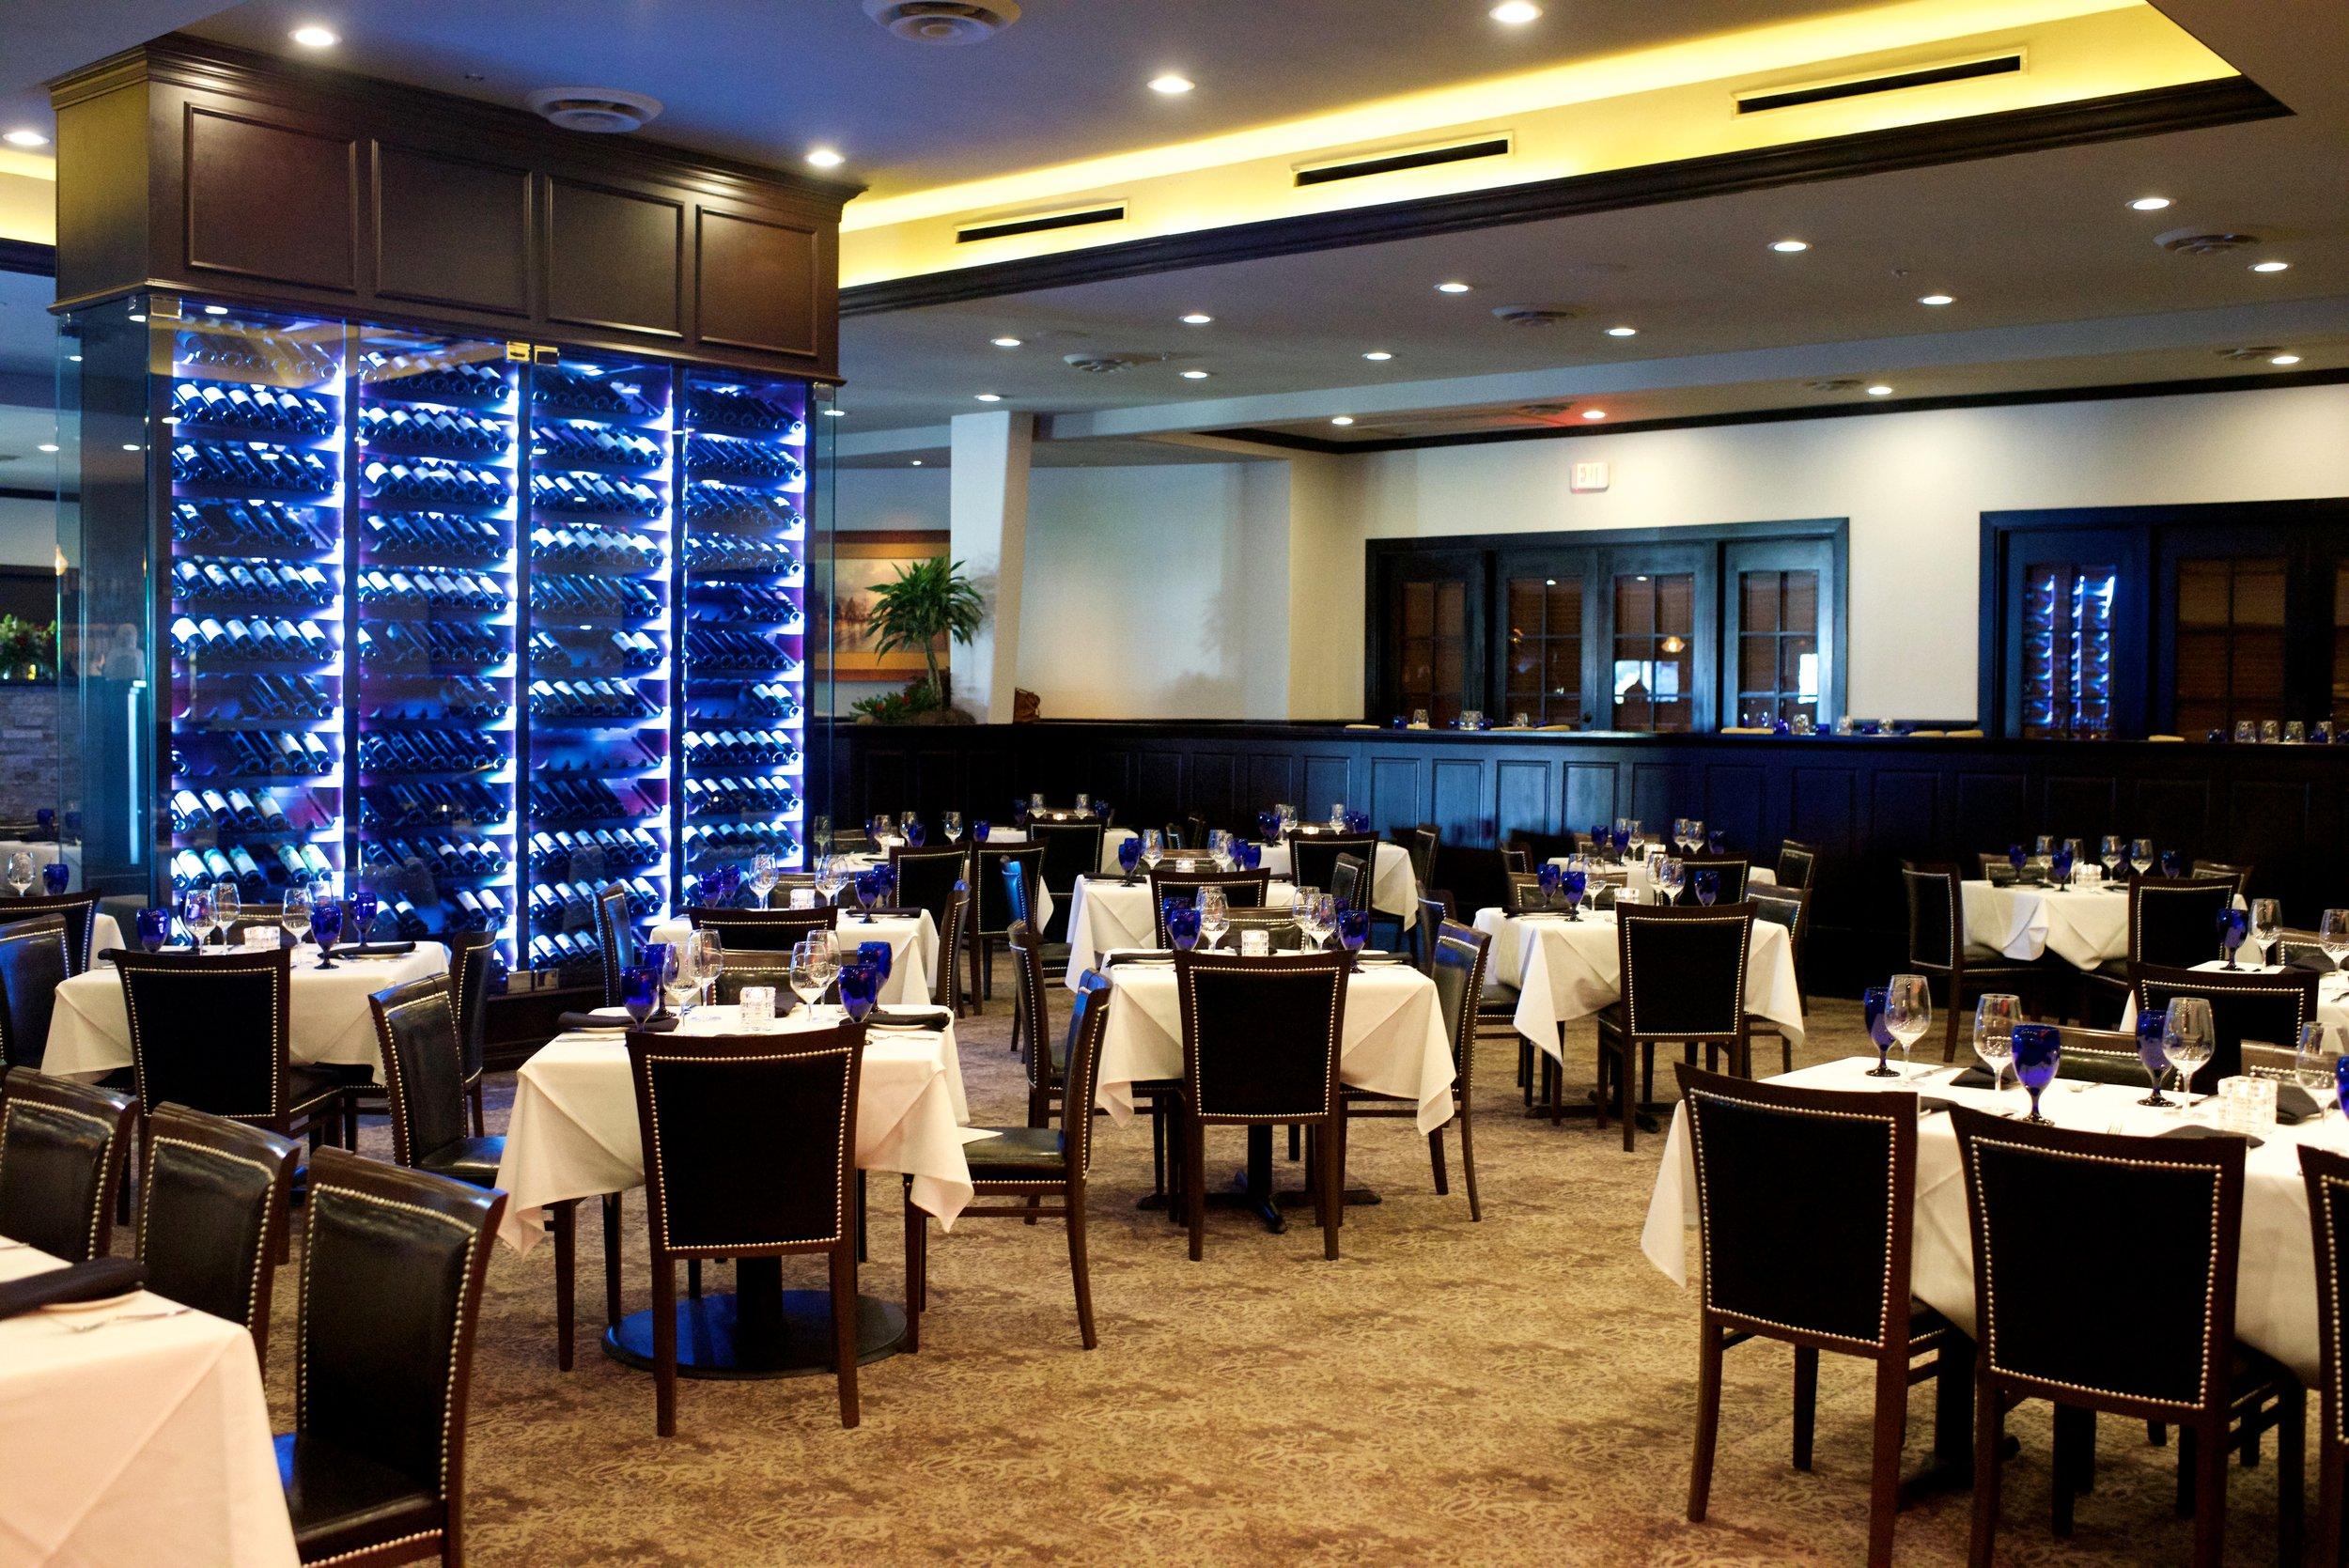 Killen's Steakhouse Interior 09-Kimberly Park.jpg